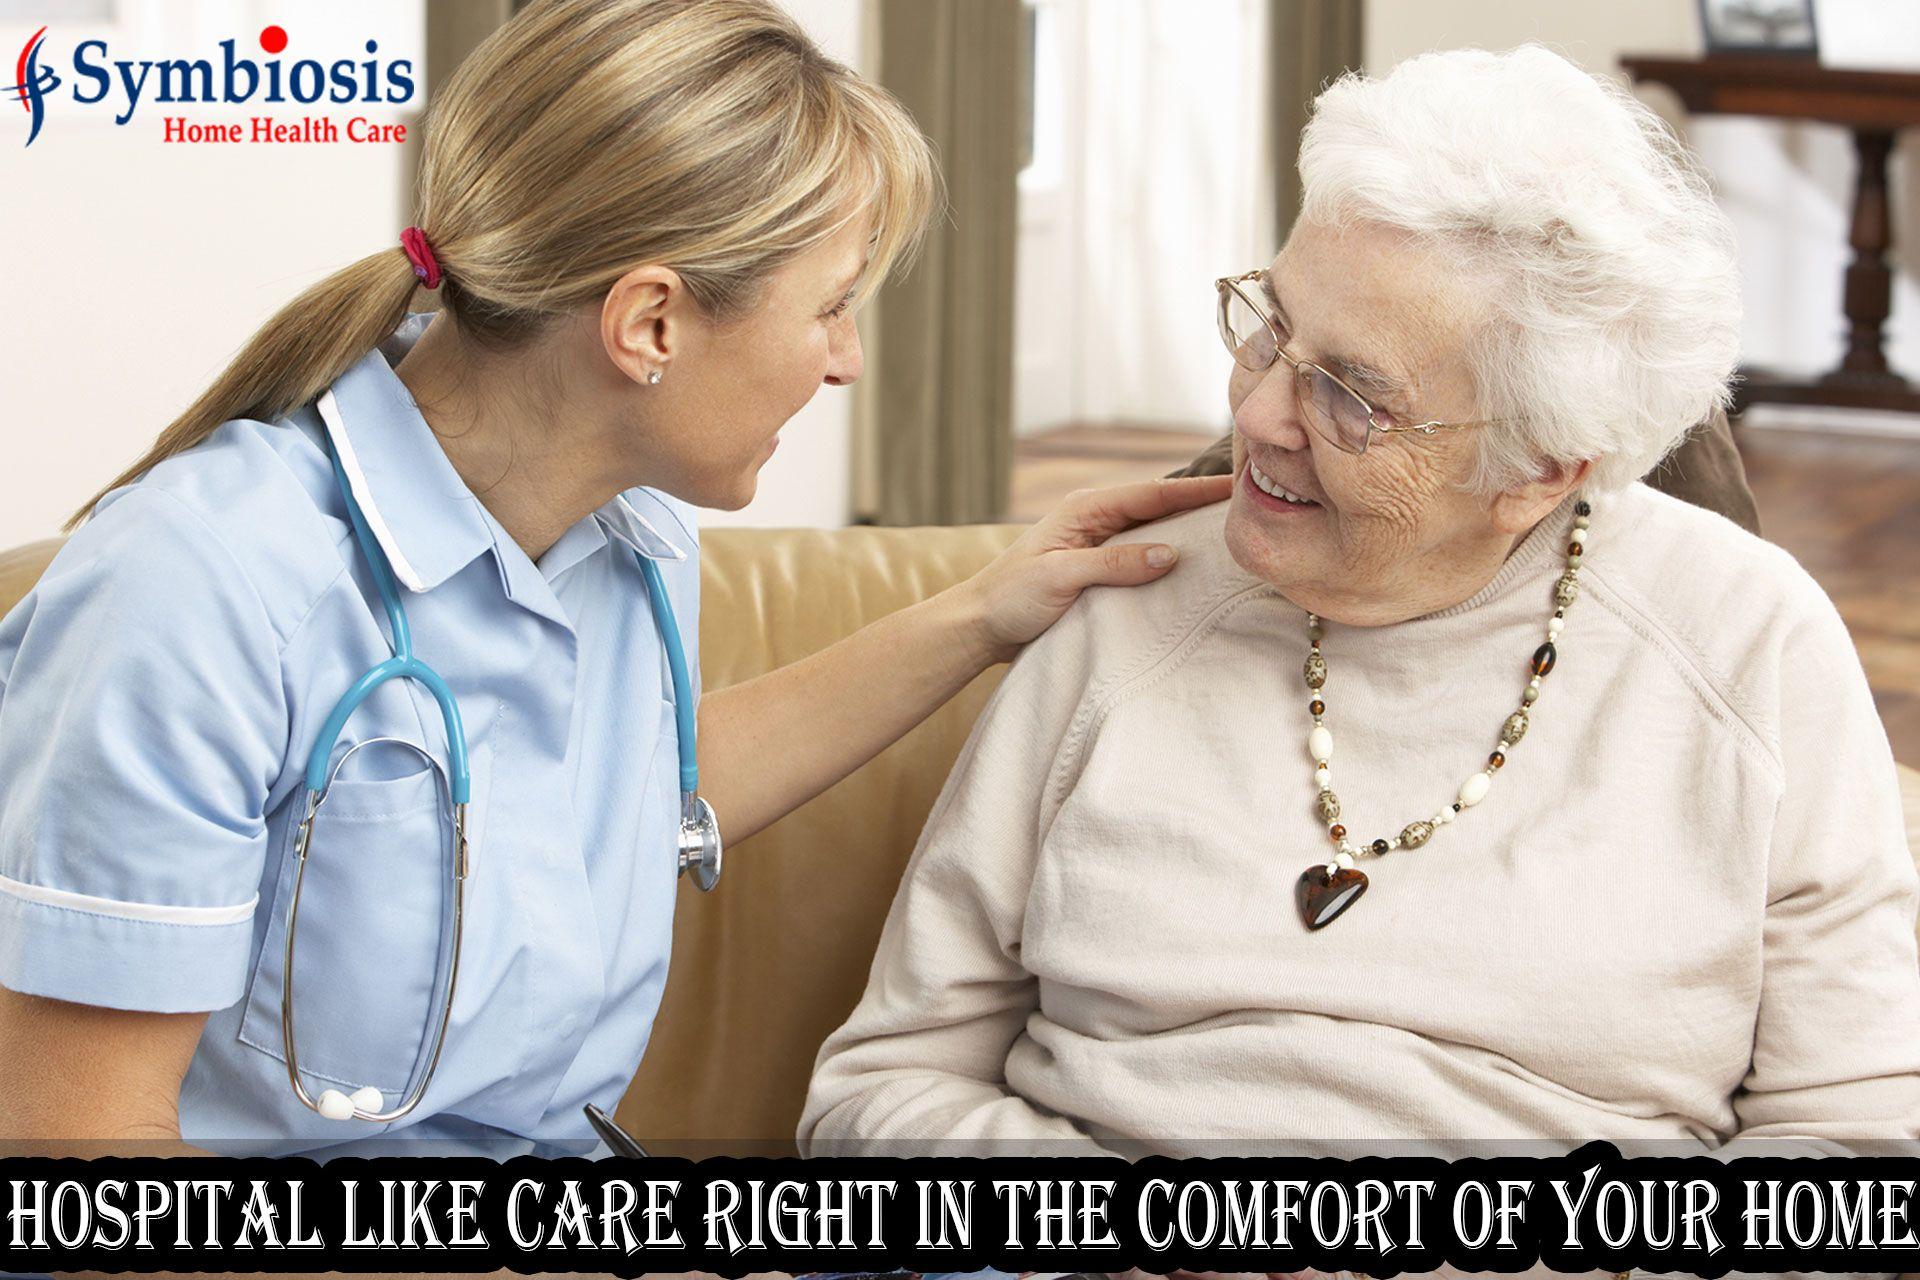 Symbiosis Home health Care Services in Dubai aims to